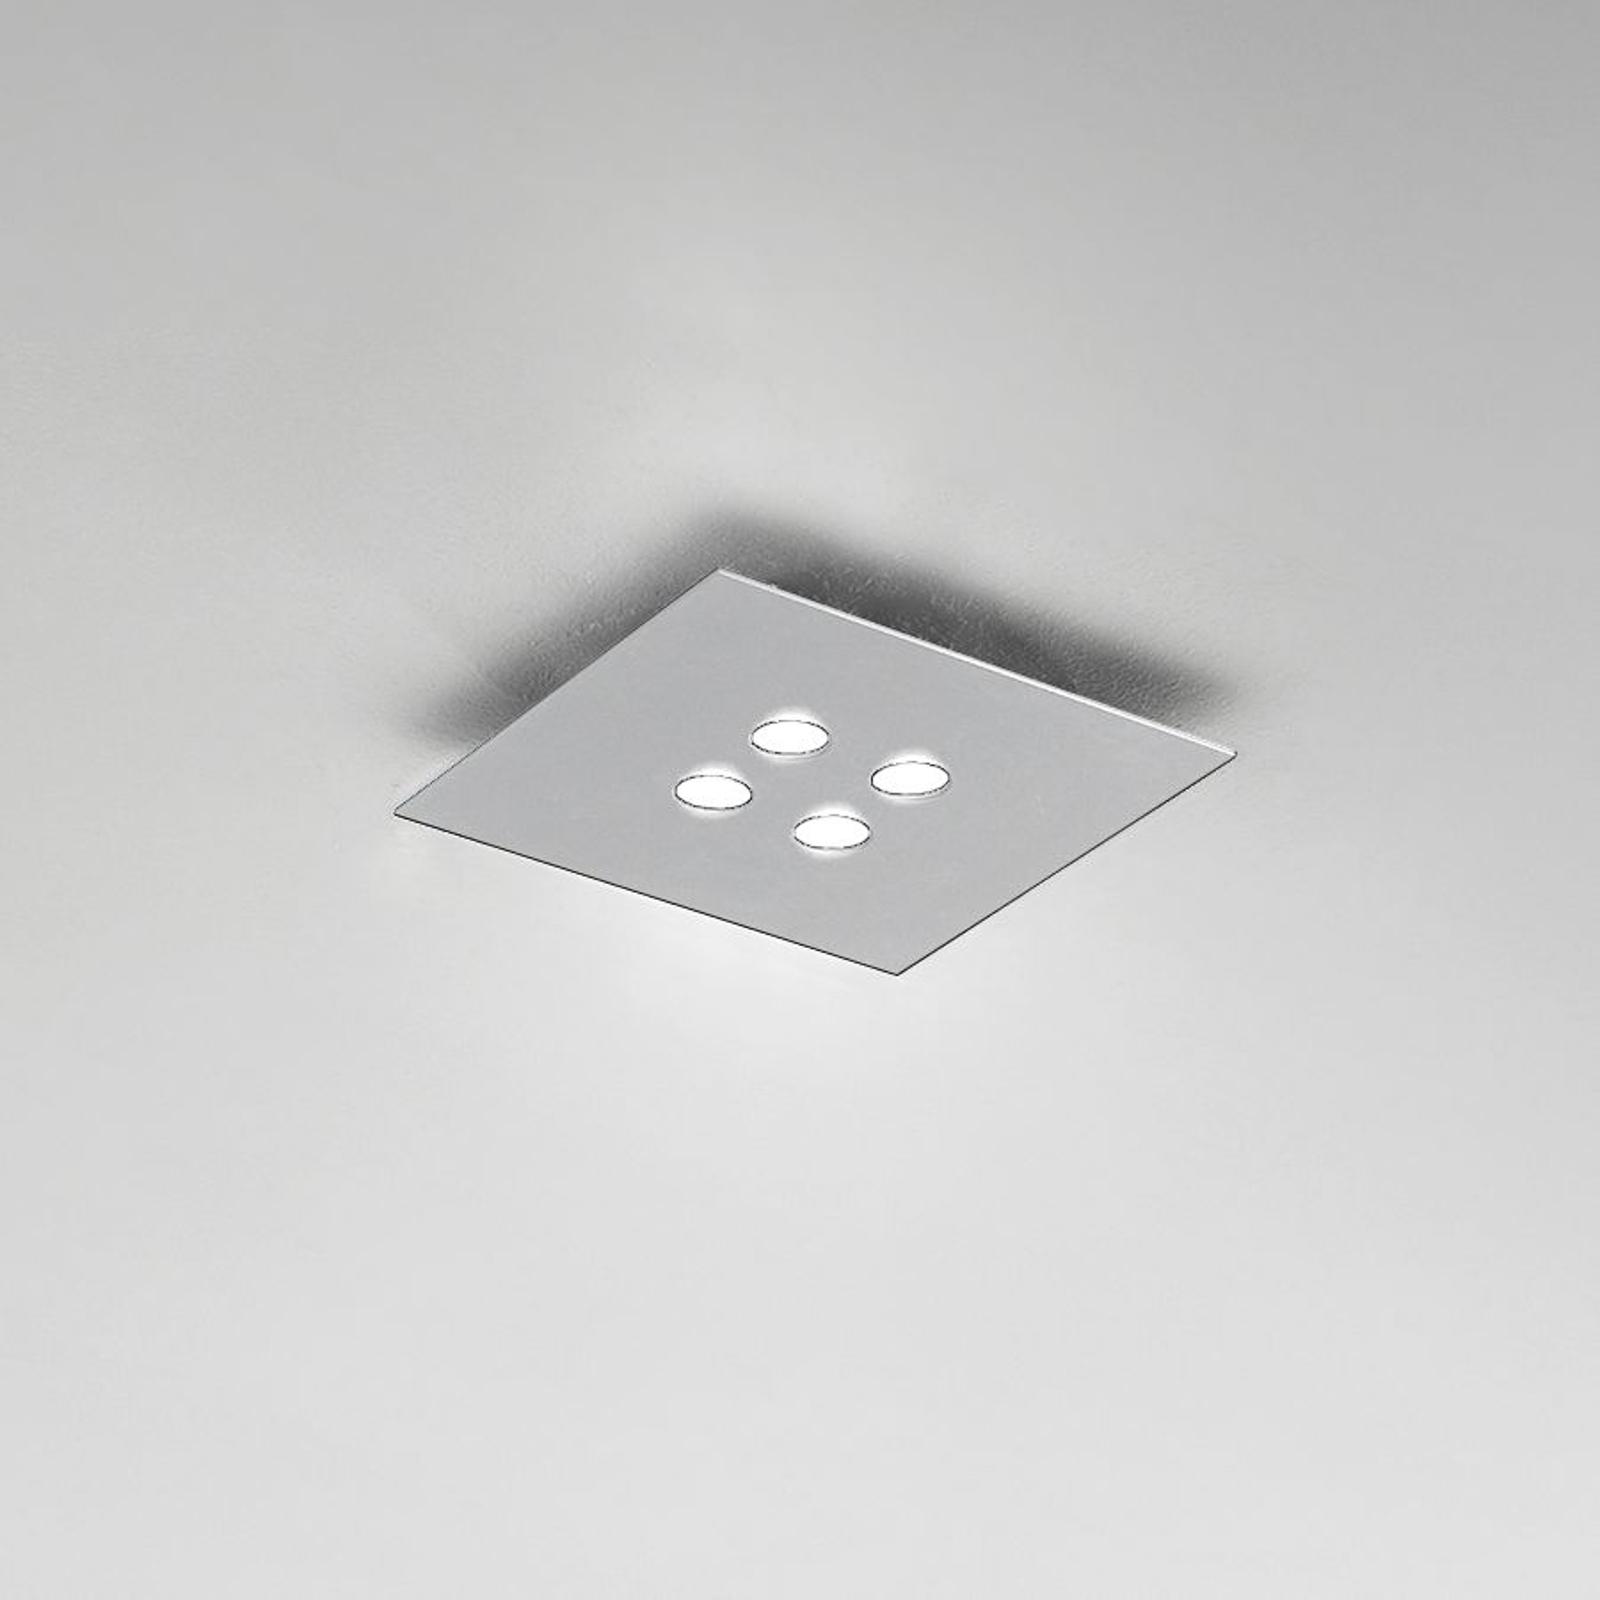 Lampa sufitowa LED Slim 4-punktowa biała